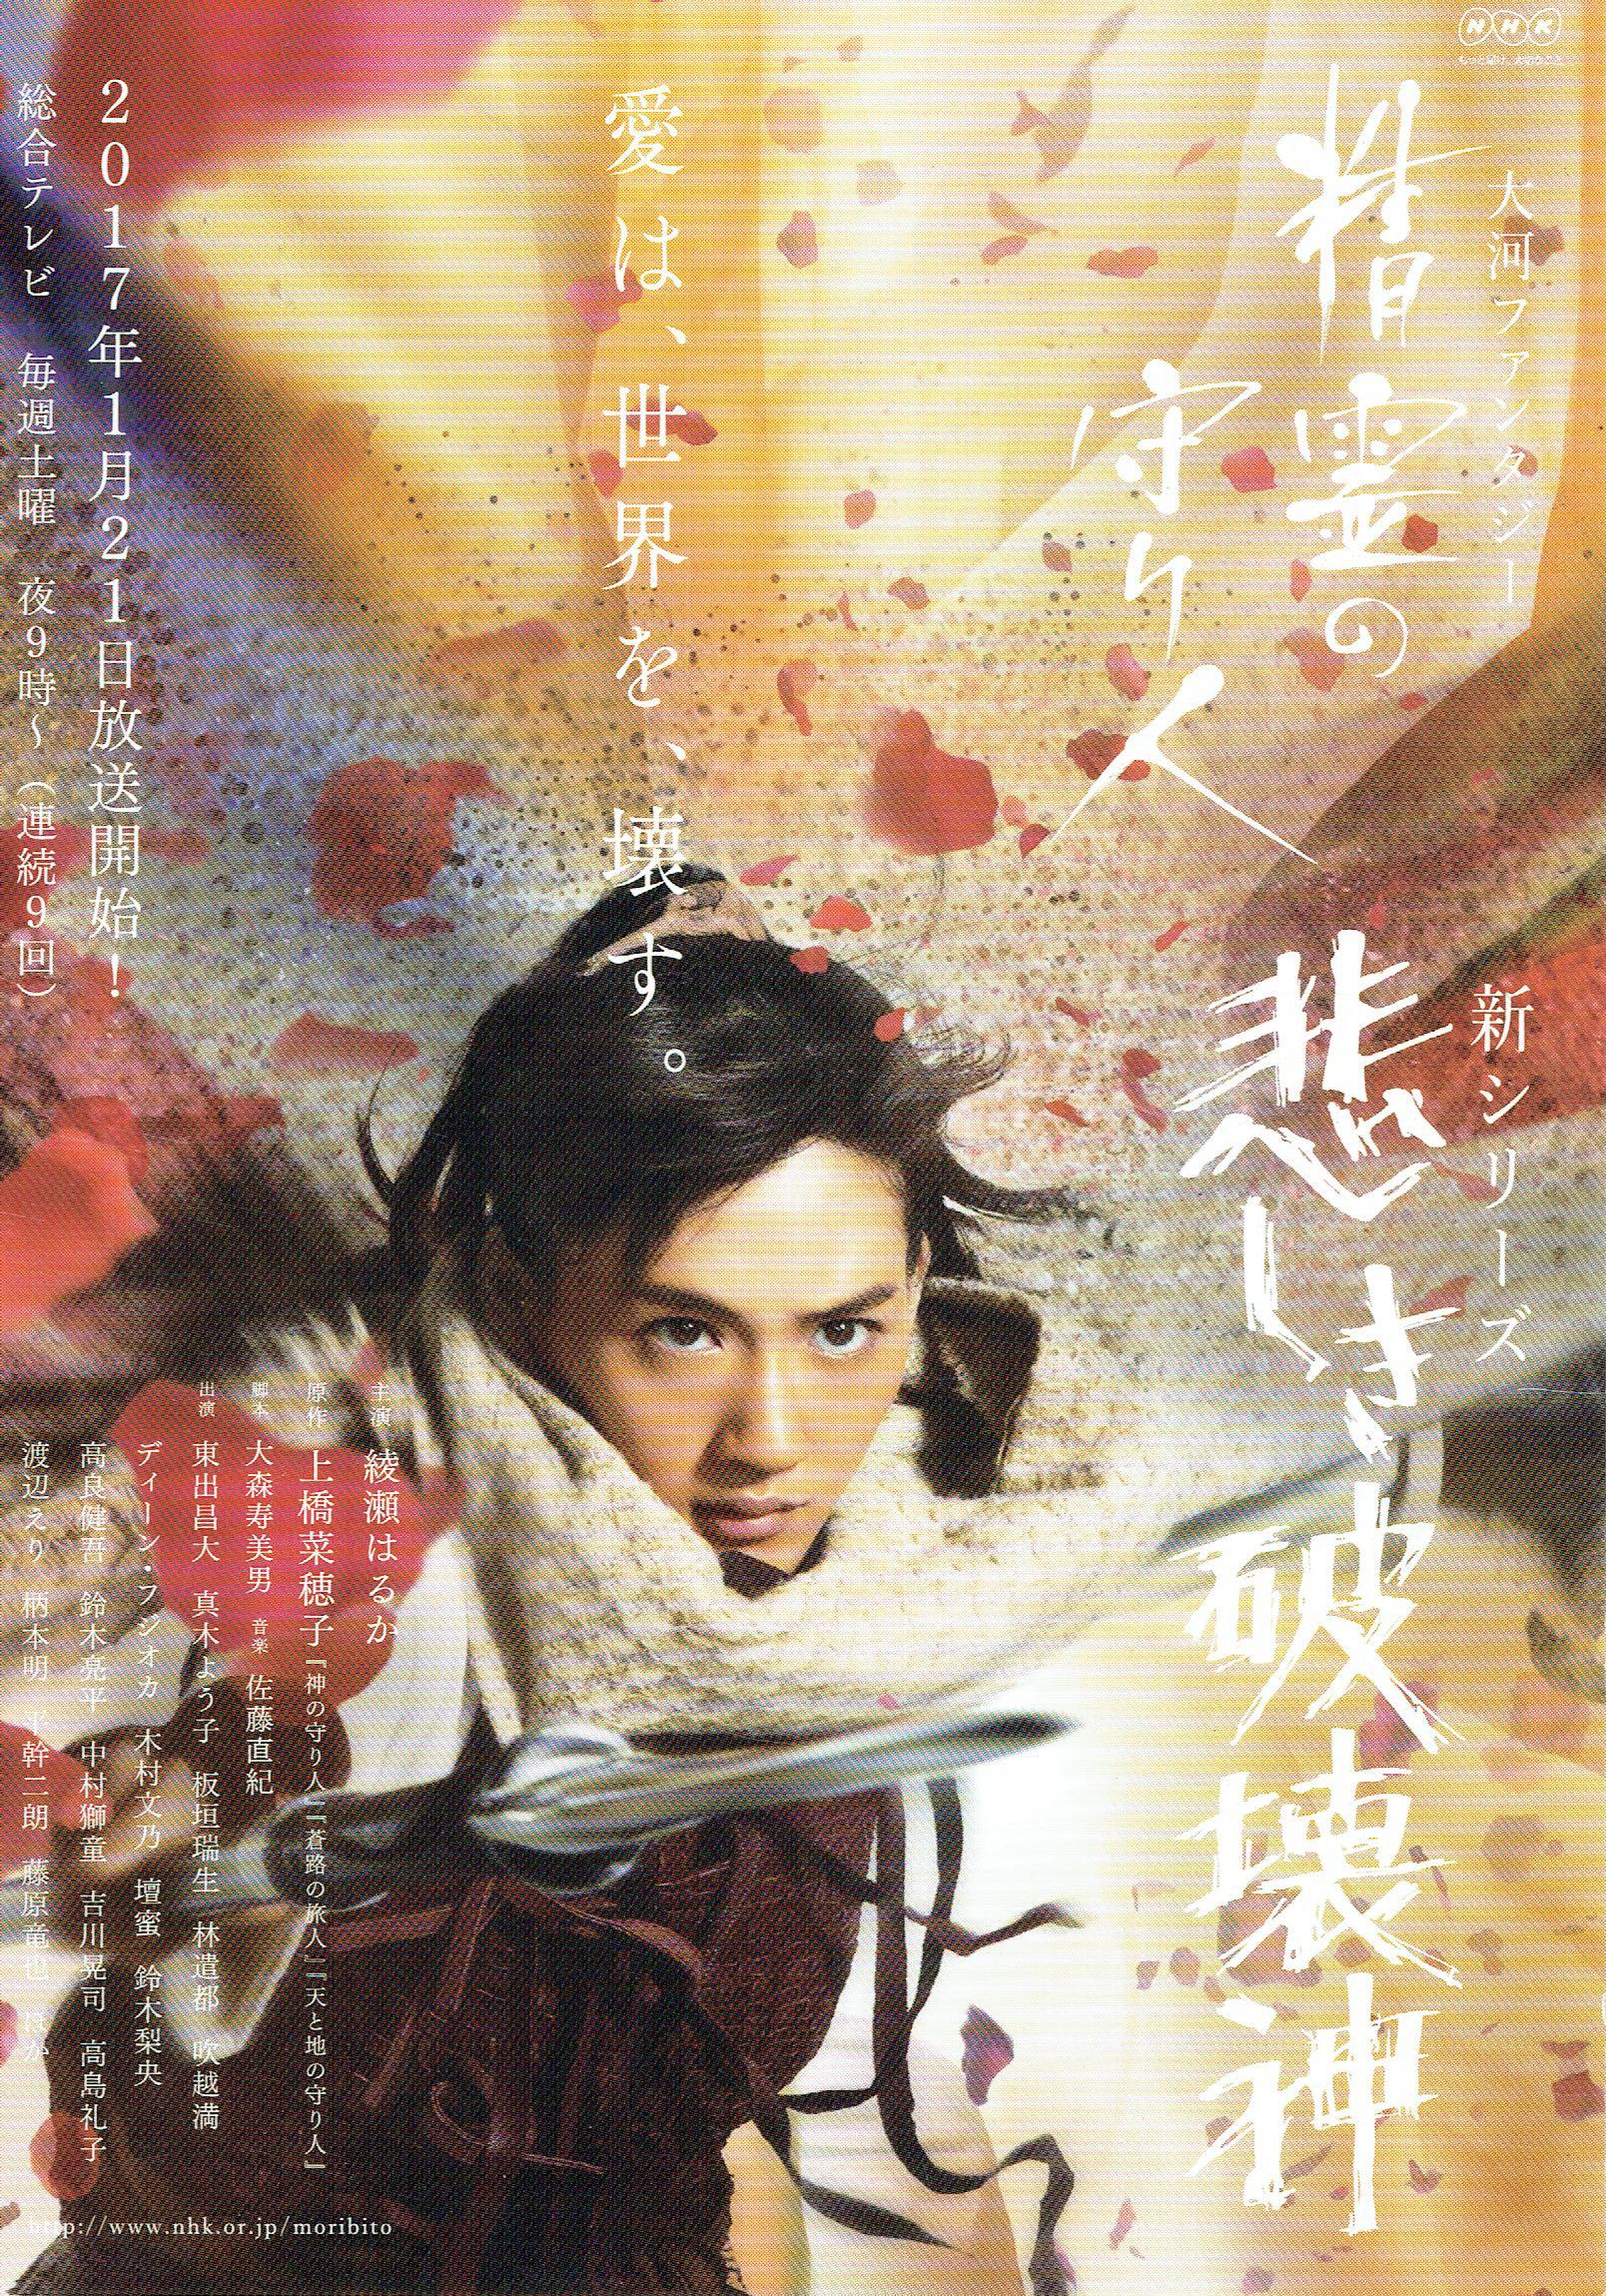 2017 NHK  大河ファンタジー「精霊の守人」 主演:綾瀬はるか